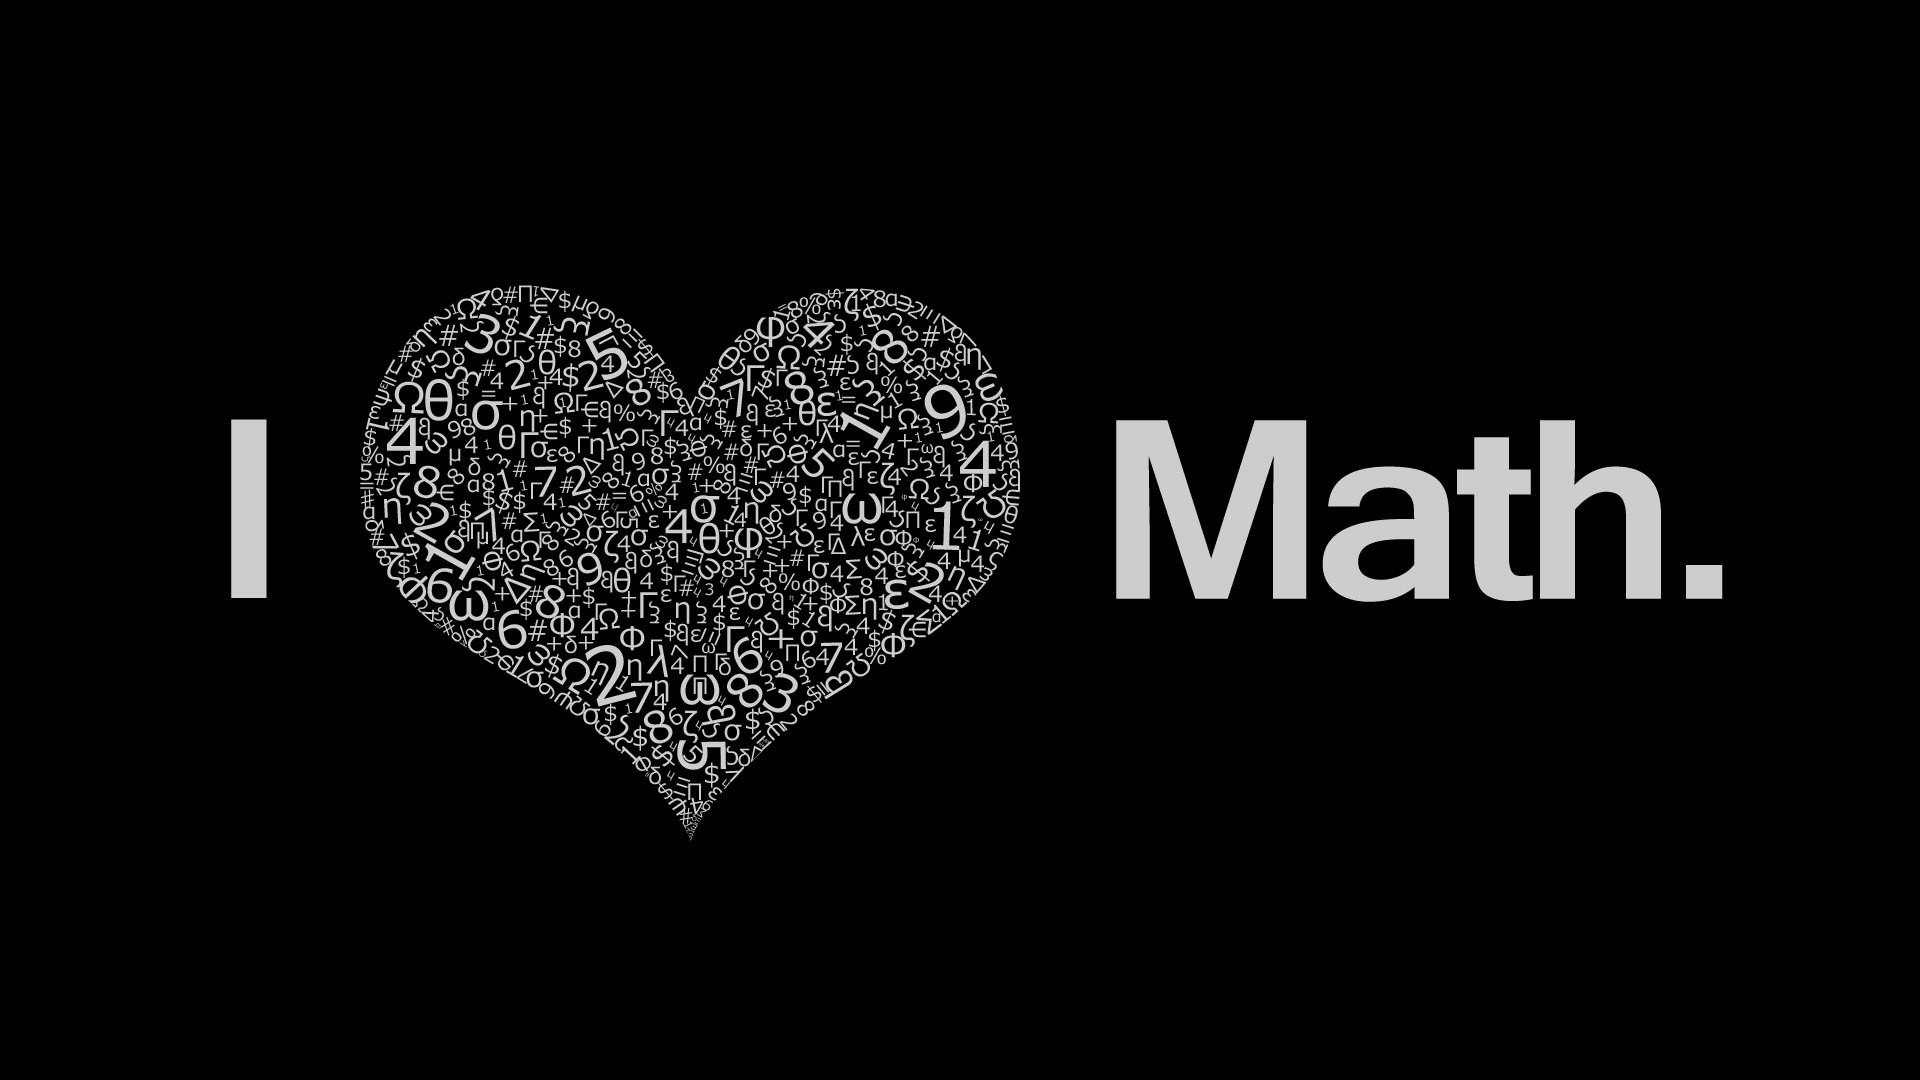 16 HD Math Desktop Wallpapers For Free Download